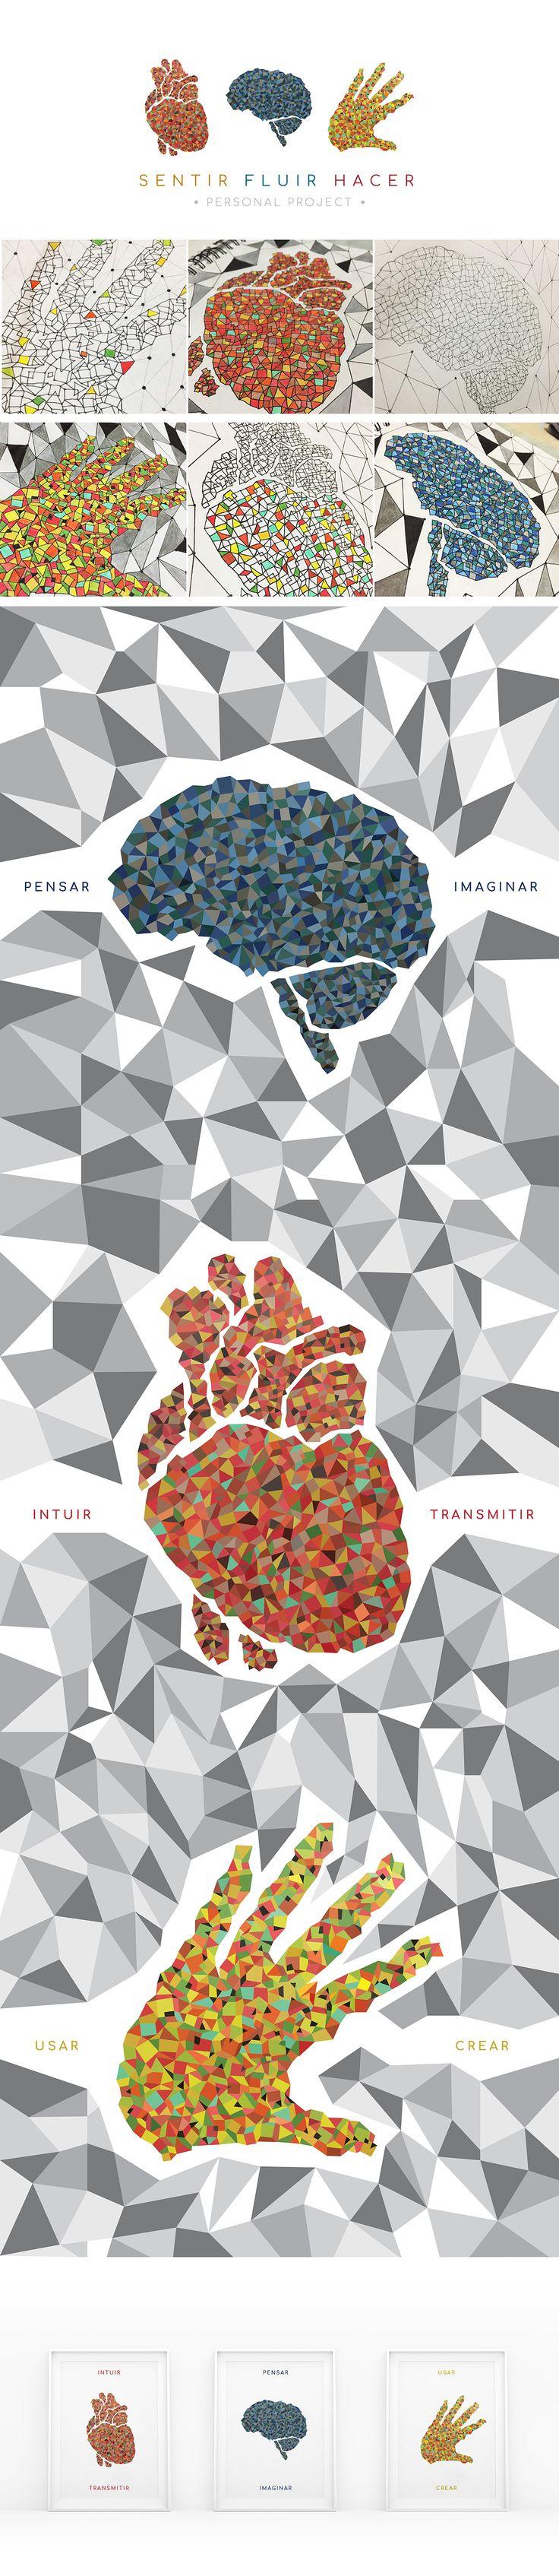 "Echa un vistazo a mi proyecto @Behance: ""Color & Senses"" https://www.behance.net/gallery/60050411/Color-Senses"